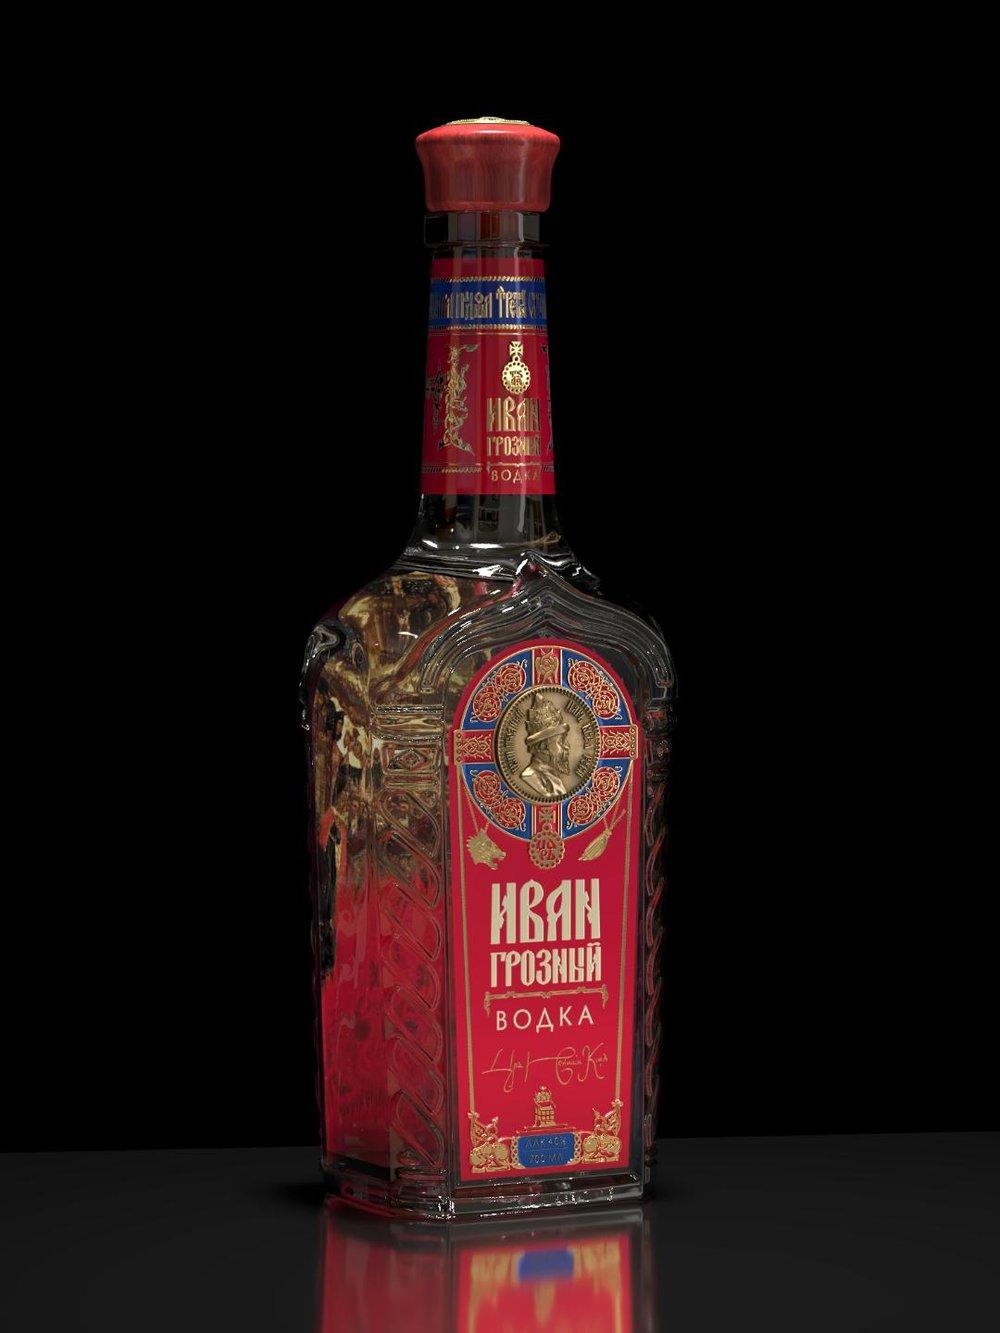 Ivan the Terrible vodka_bottle dark background_right view.jpg